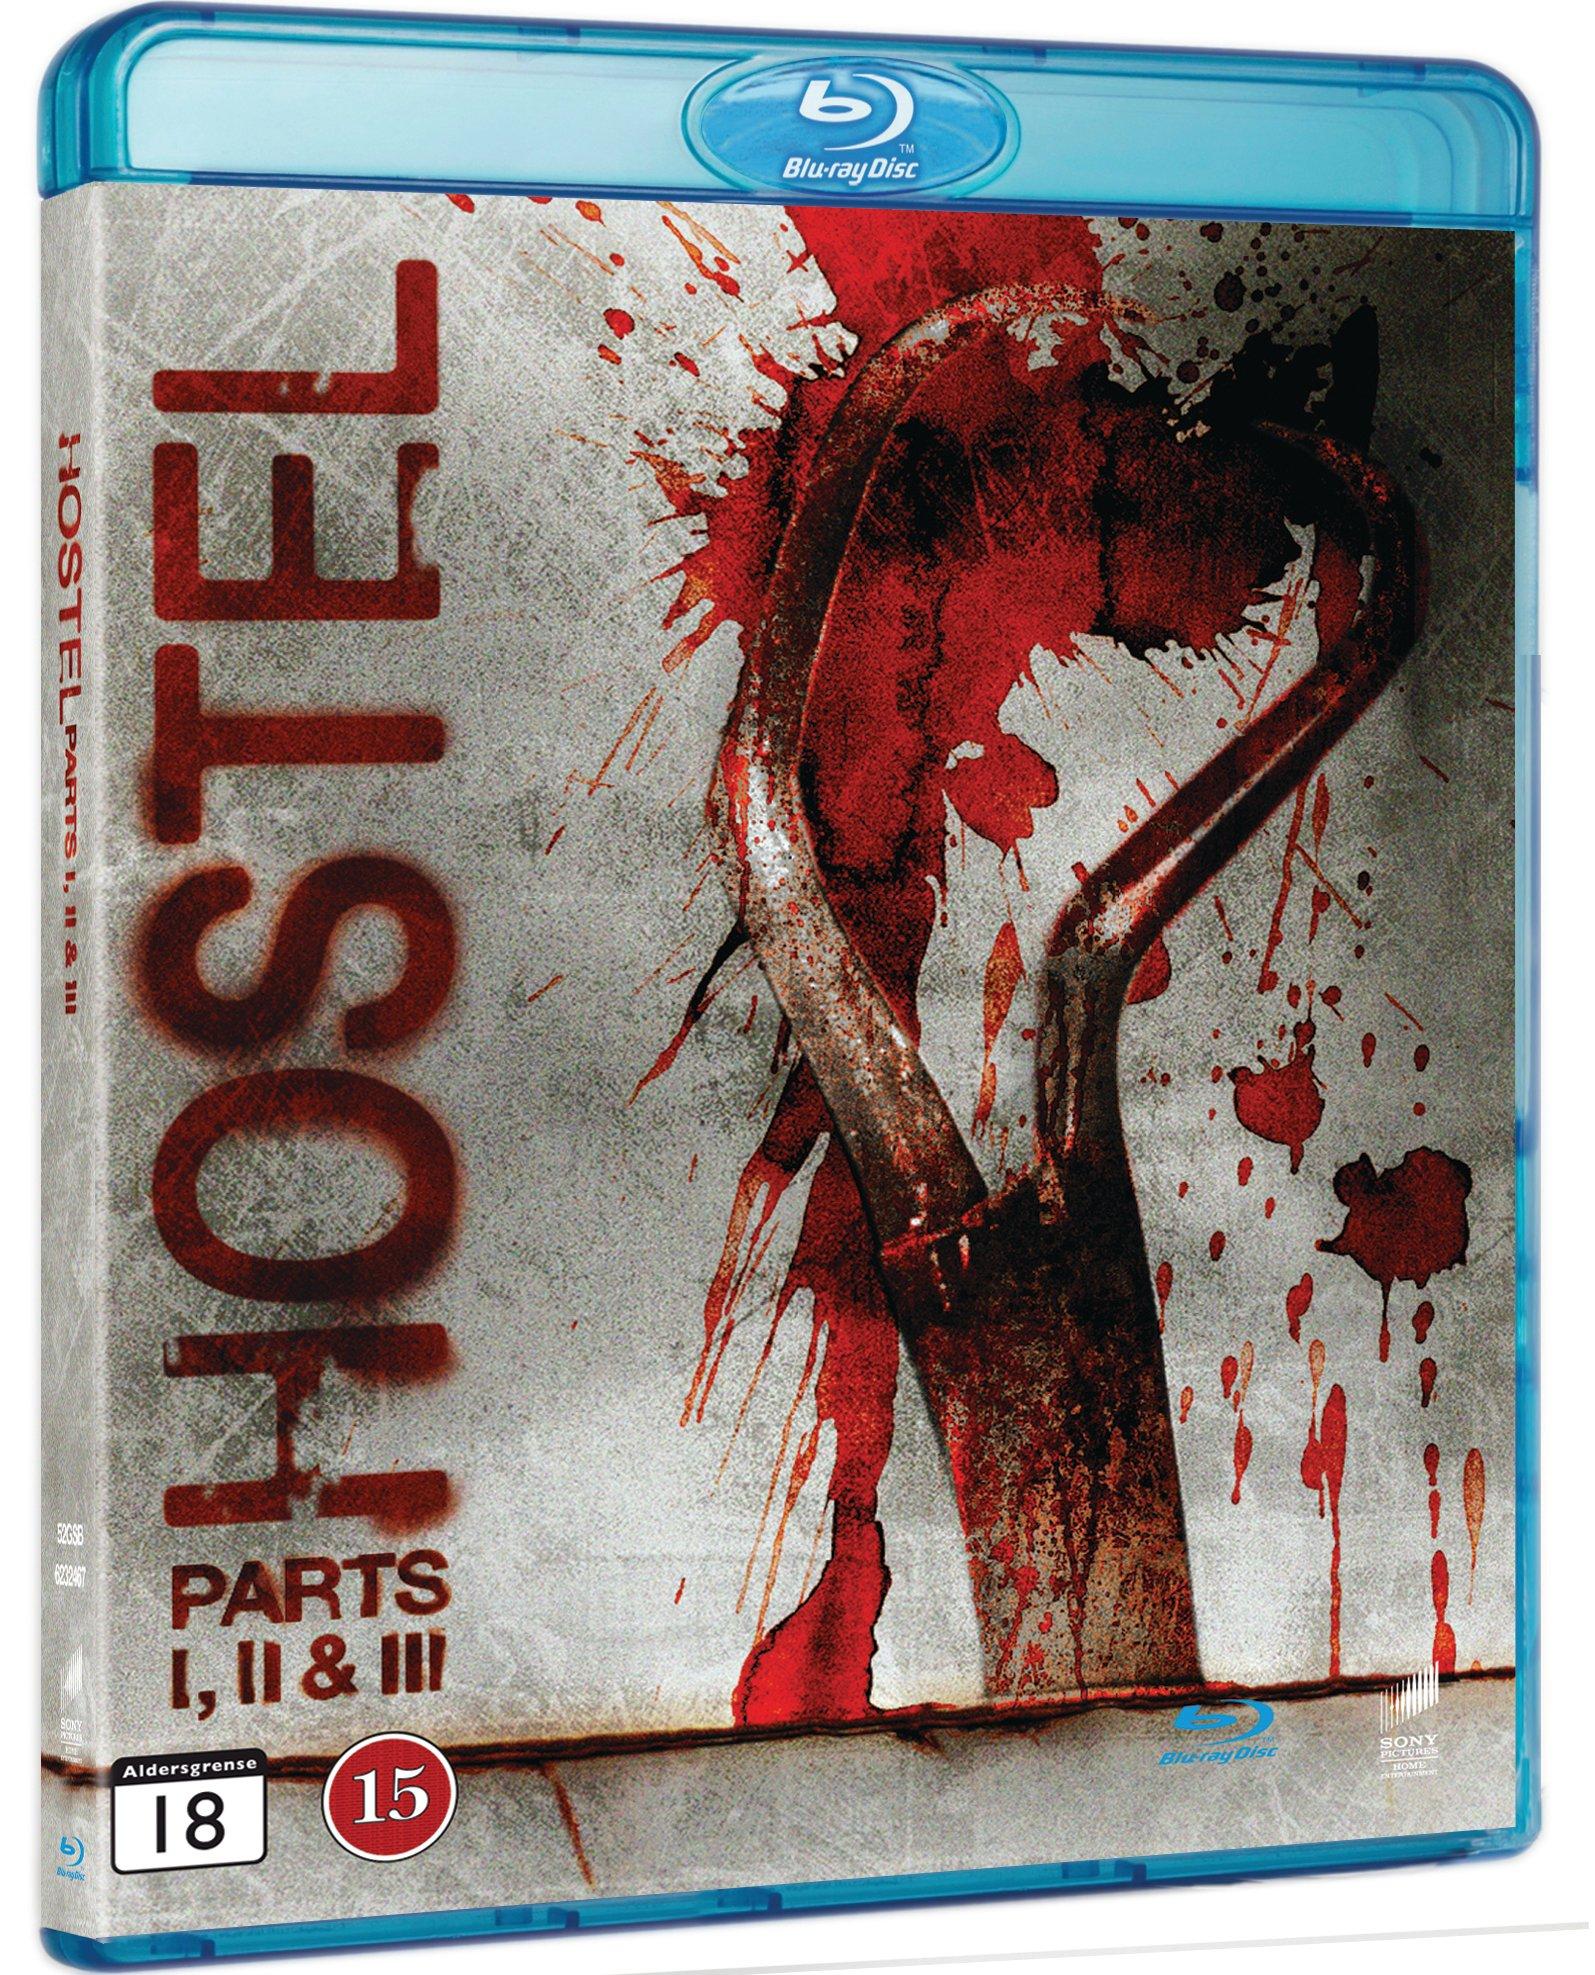 Hostel Part I-III - Blu ray